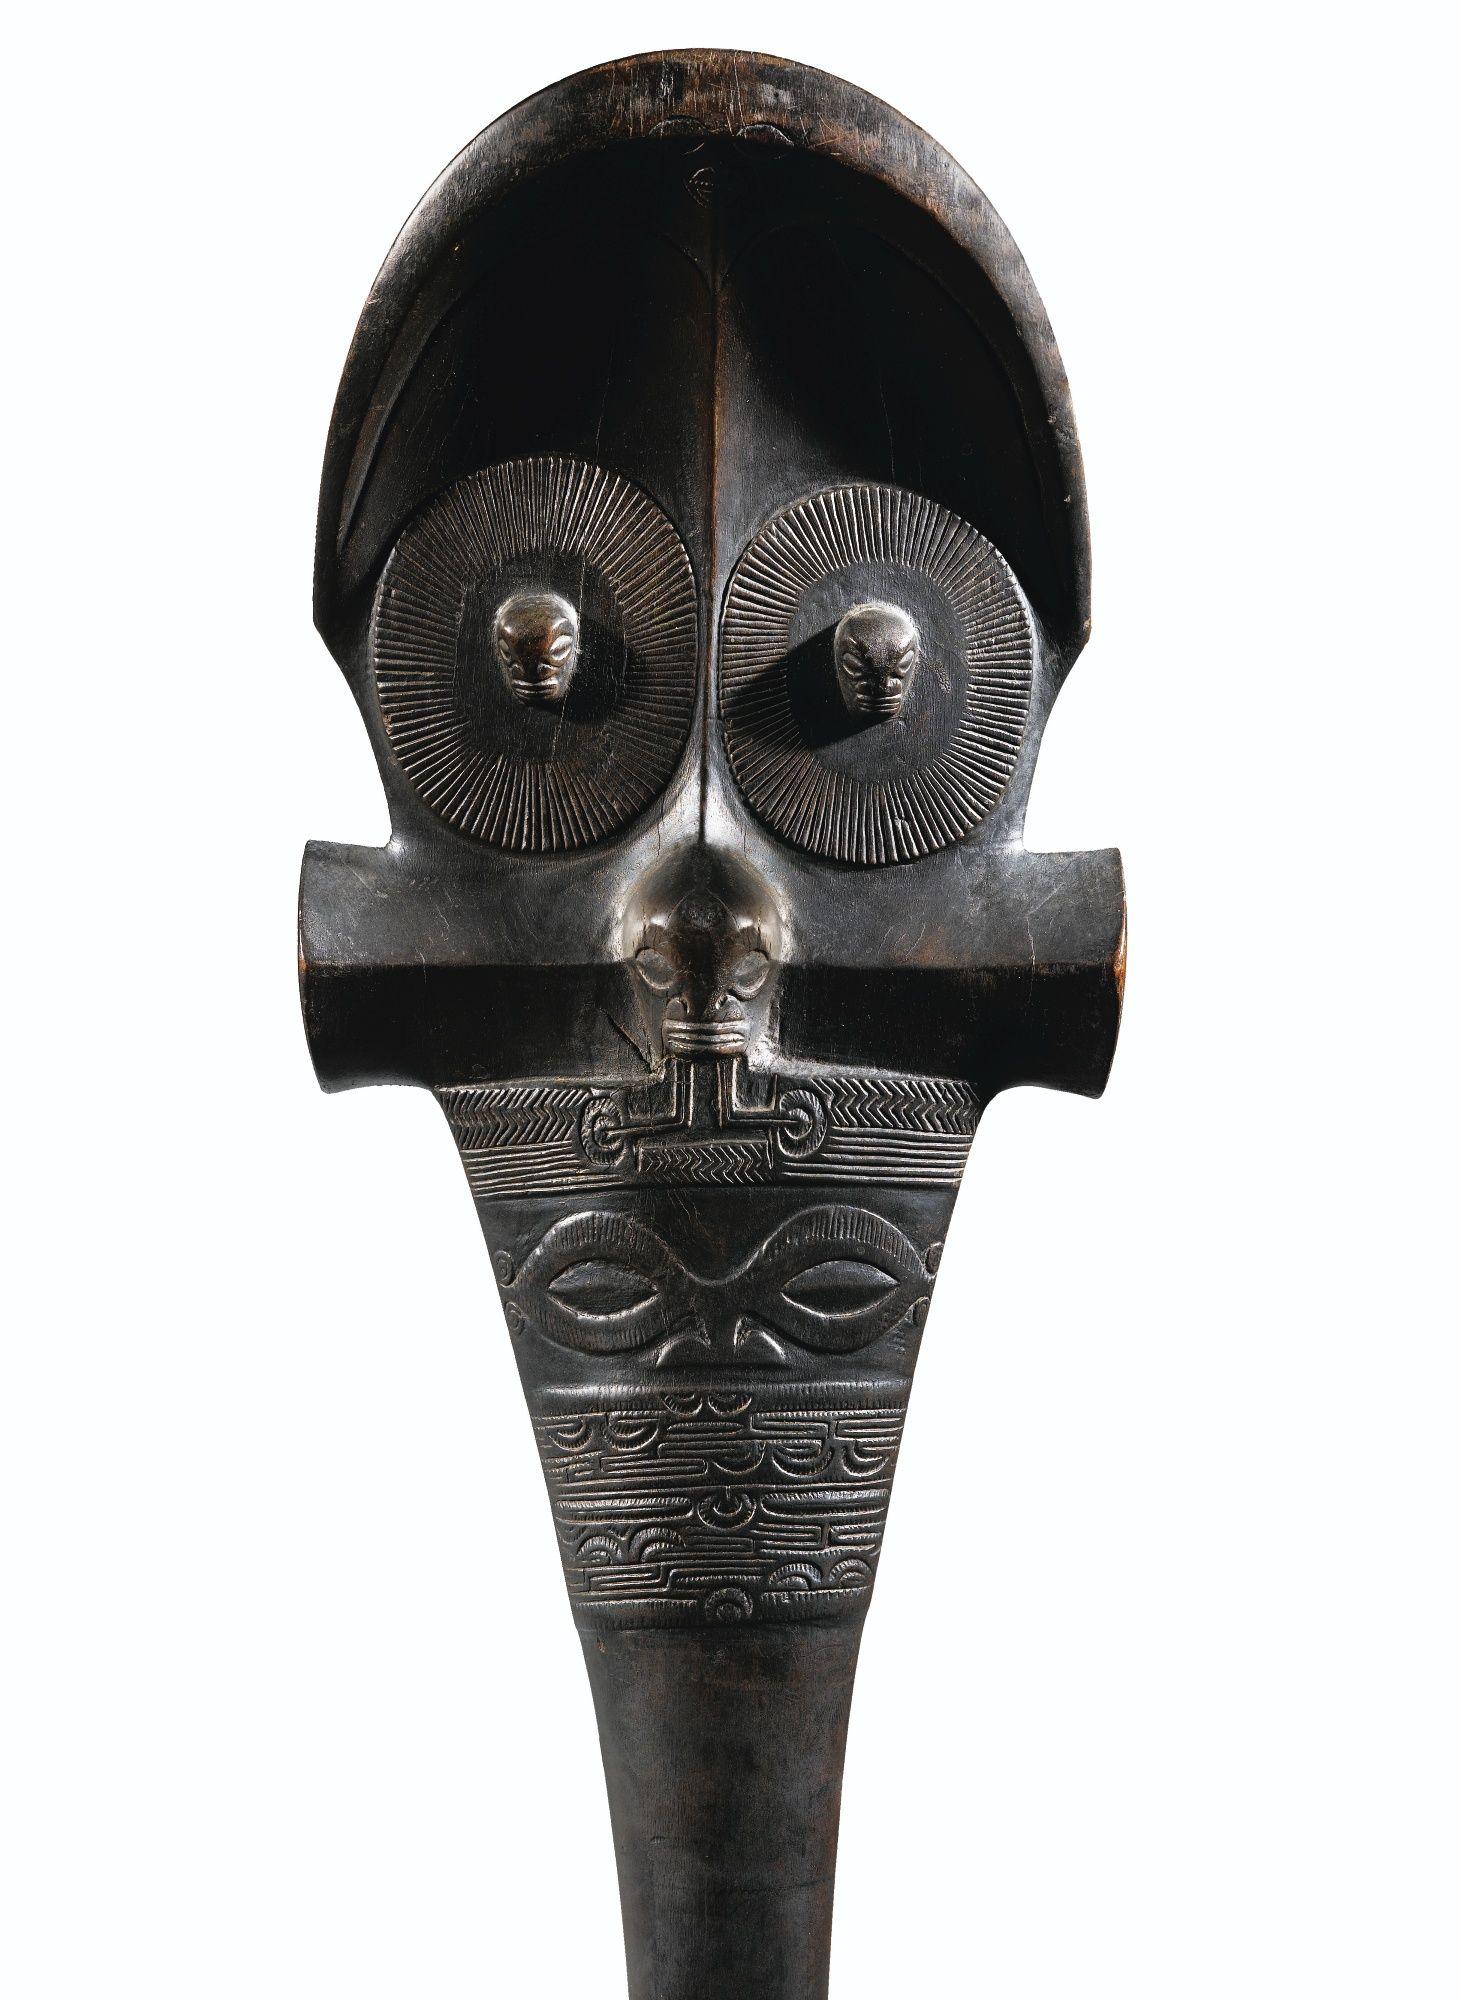 massue u'u | weapon | sotheby's pf1438lot6vdrven